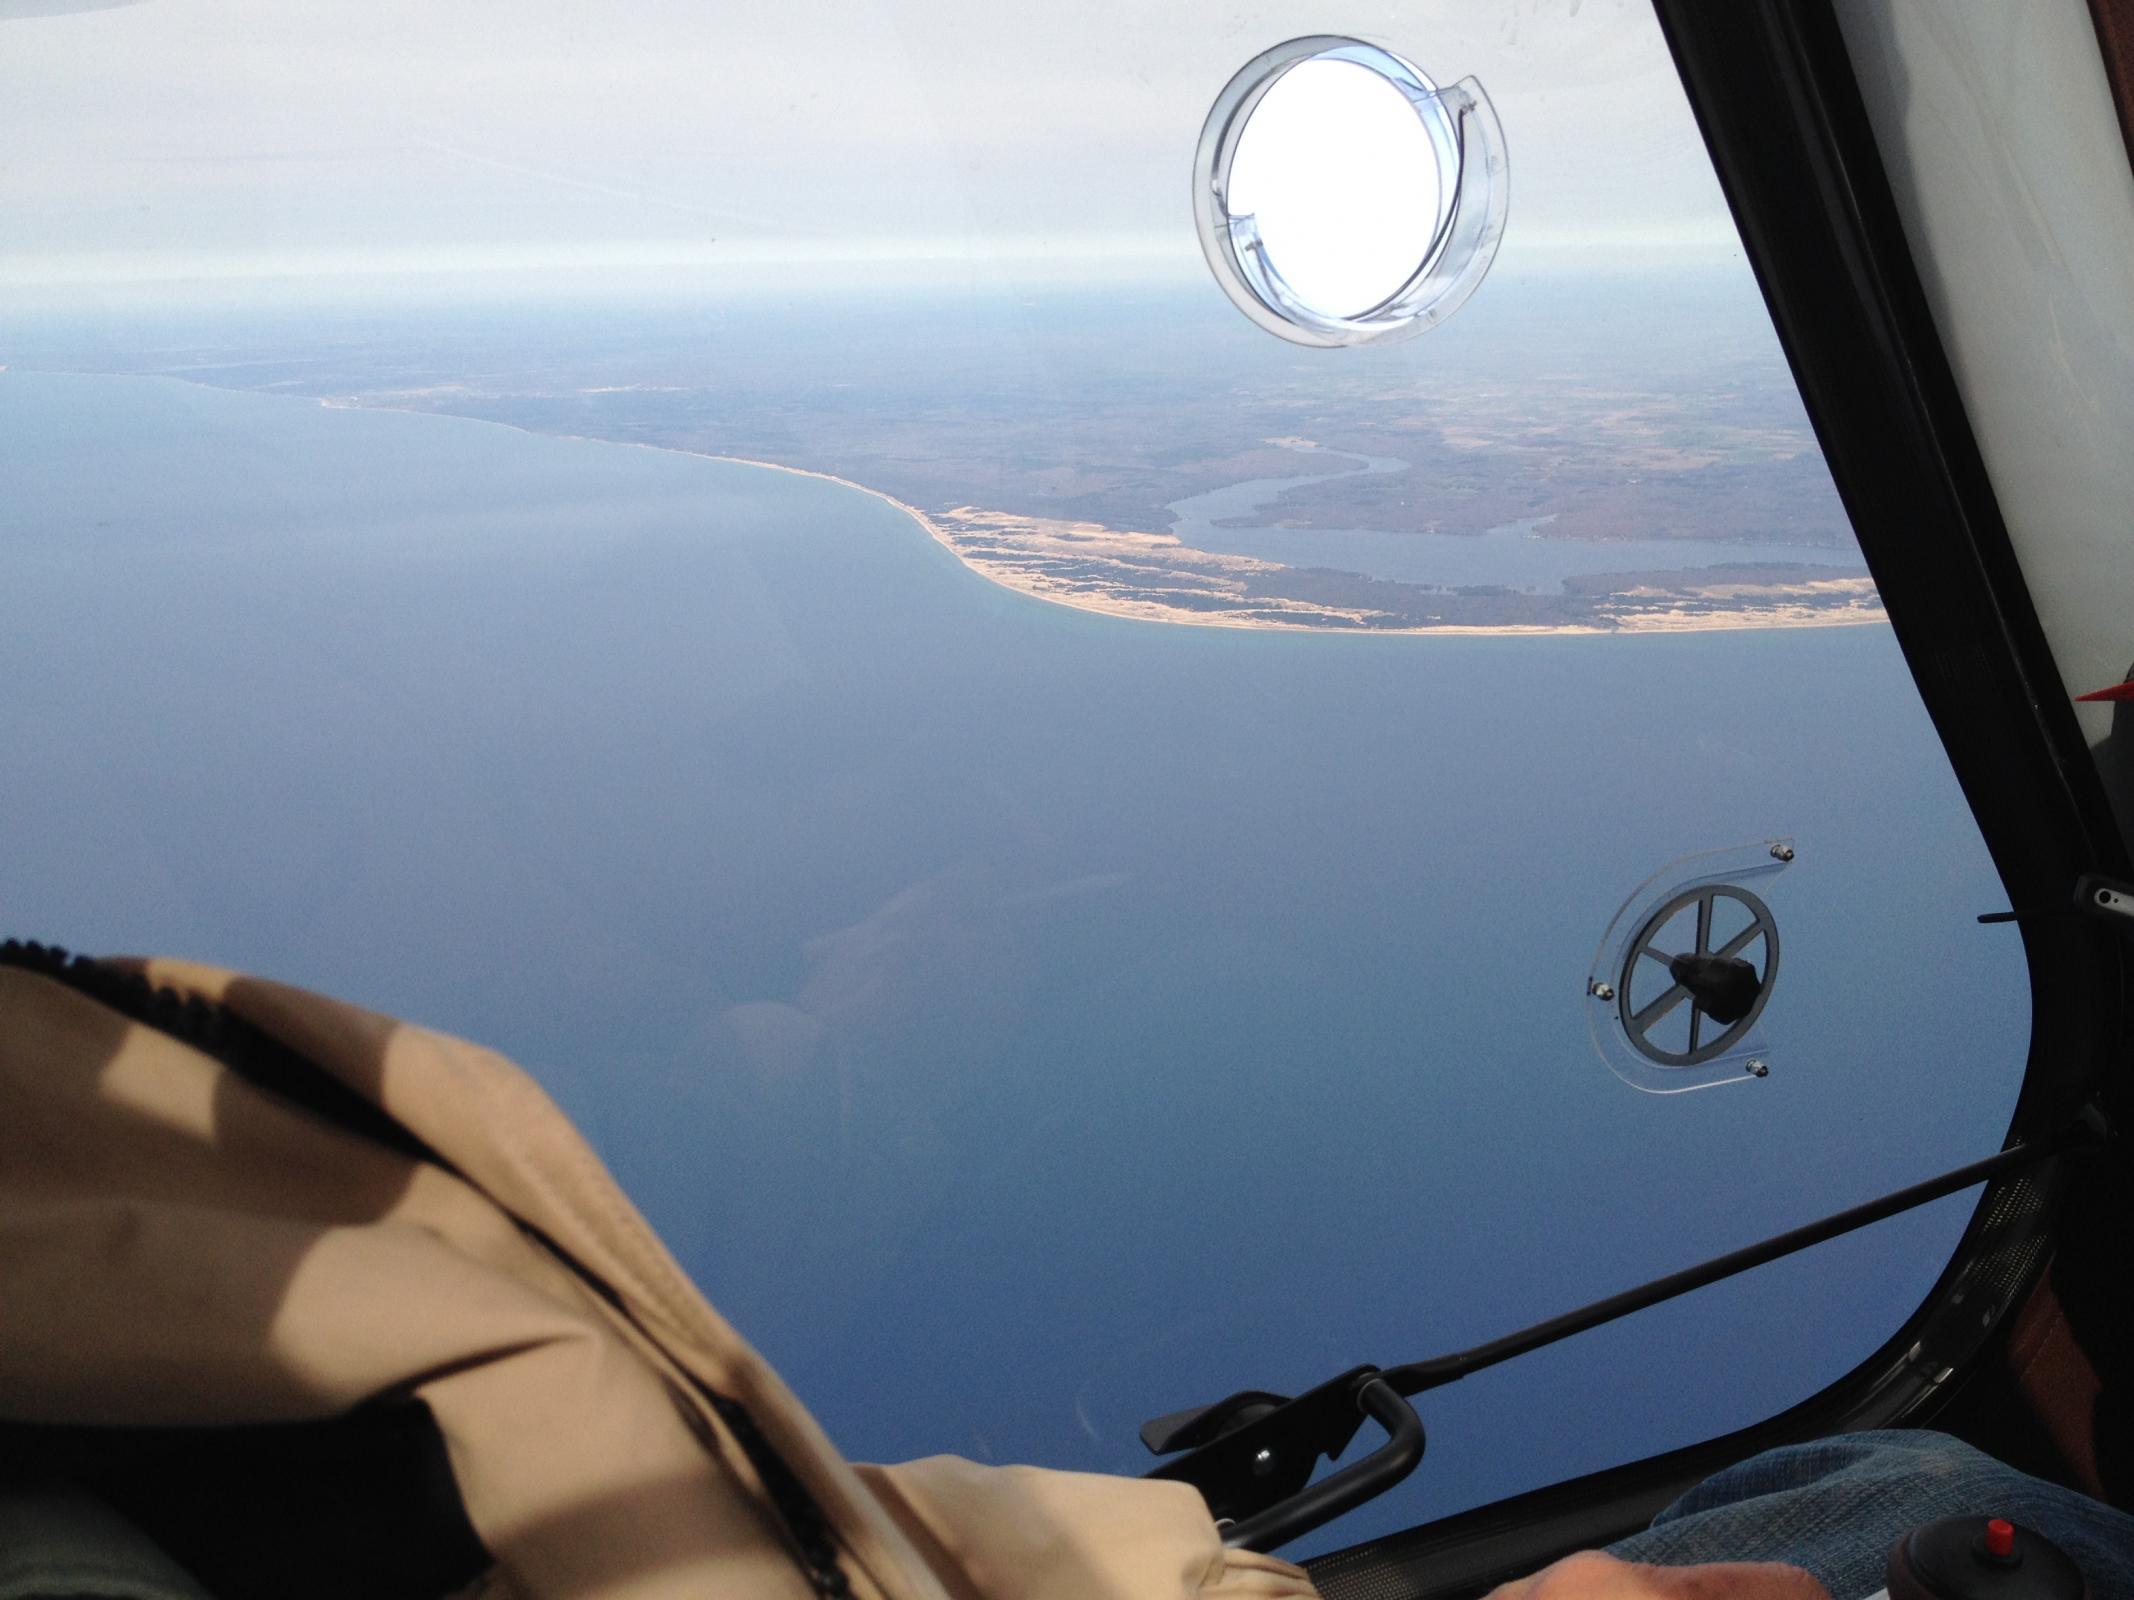 Approaching Lake Michigan shoreline